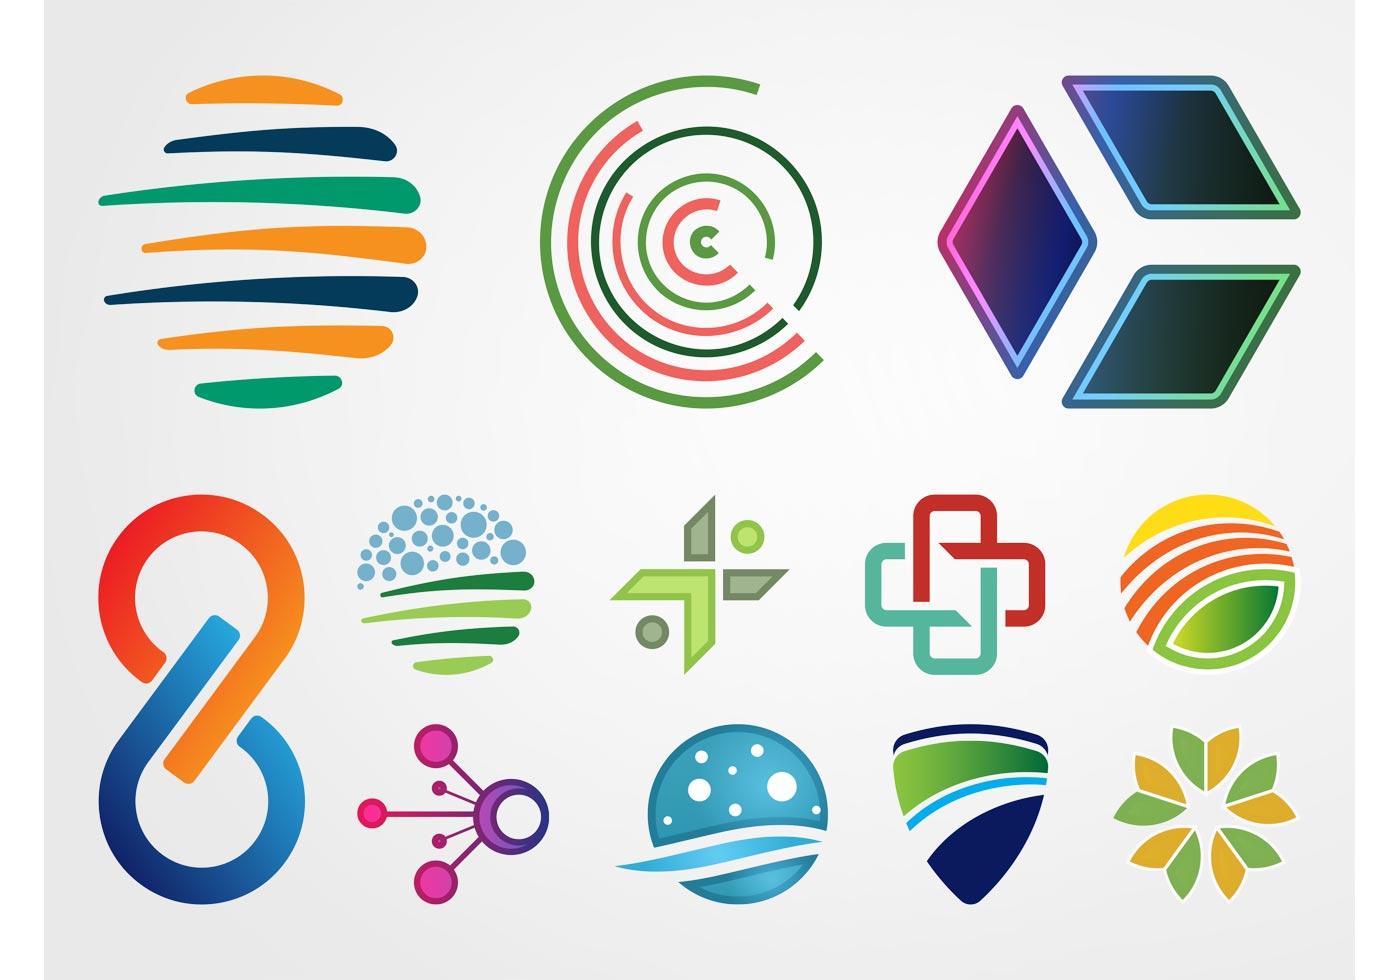 Abstract Logos Vector Download Free Vector Art Stock